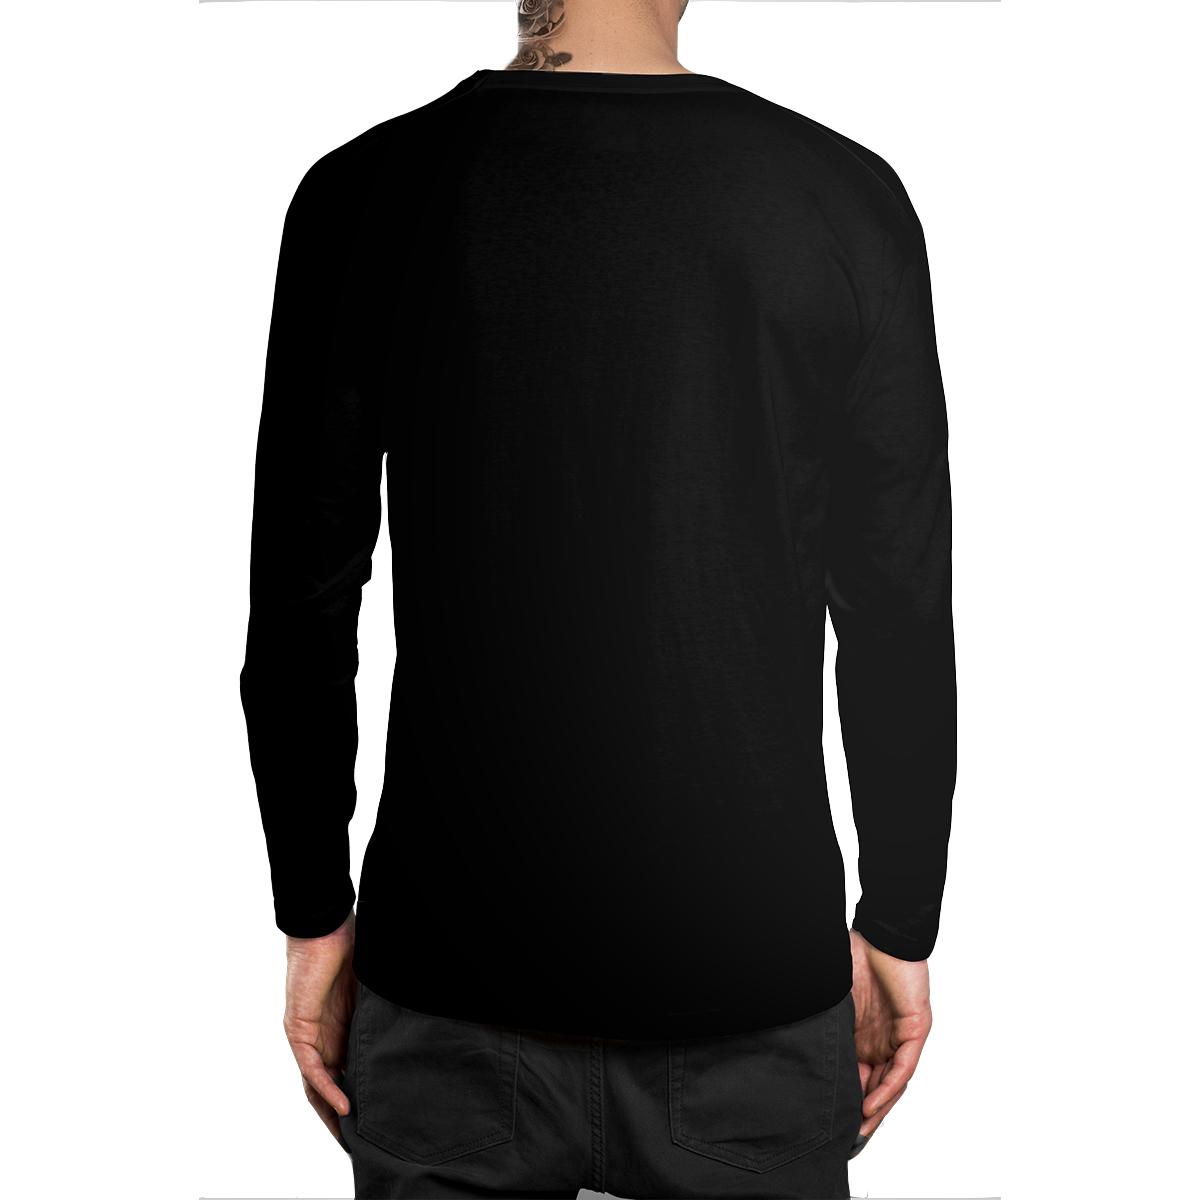 Stompy Camiseta Manga Longa Modelo 46